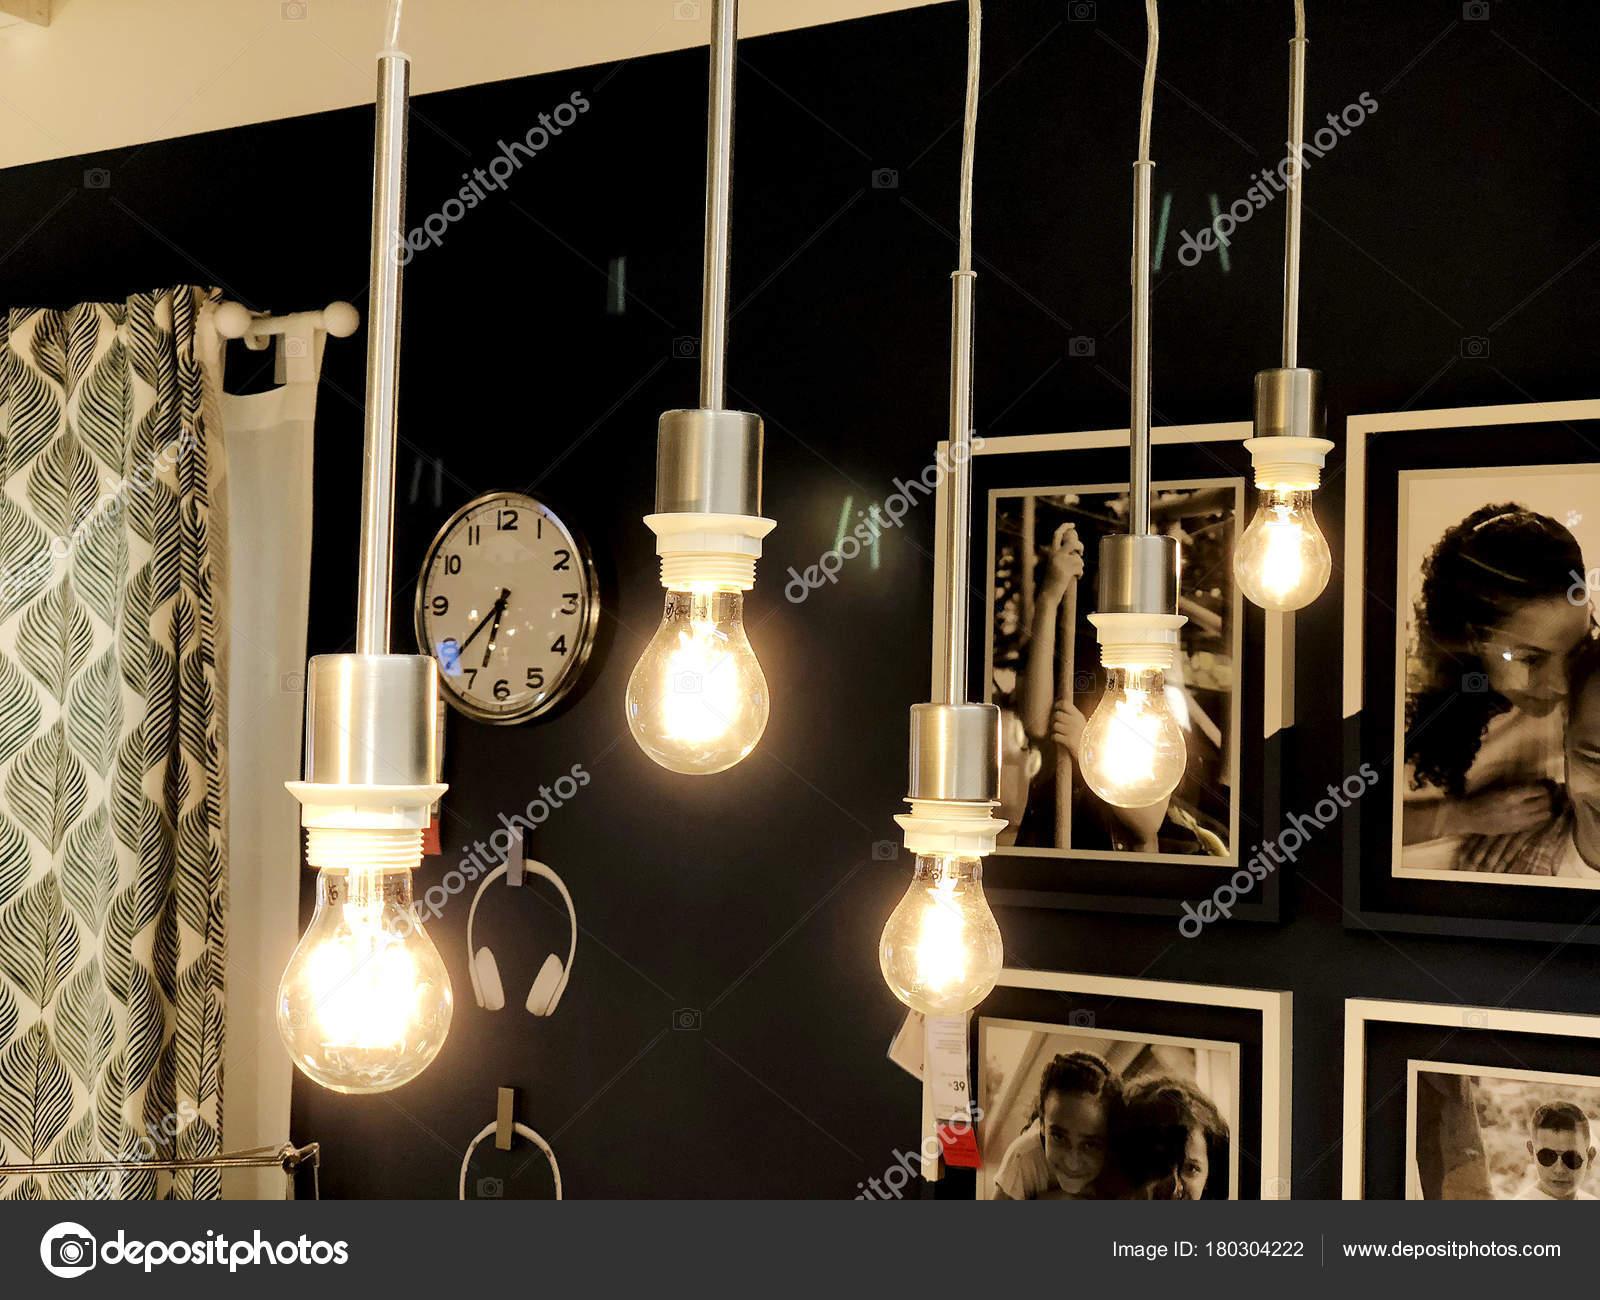 Rishon le zion israël december moderne stijl lamp lamp